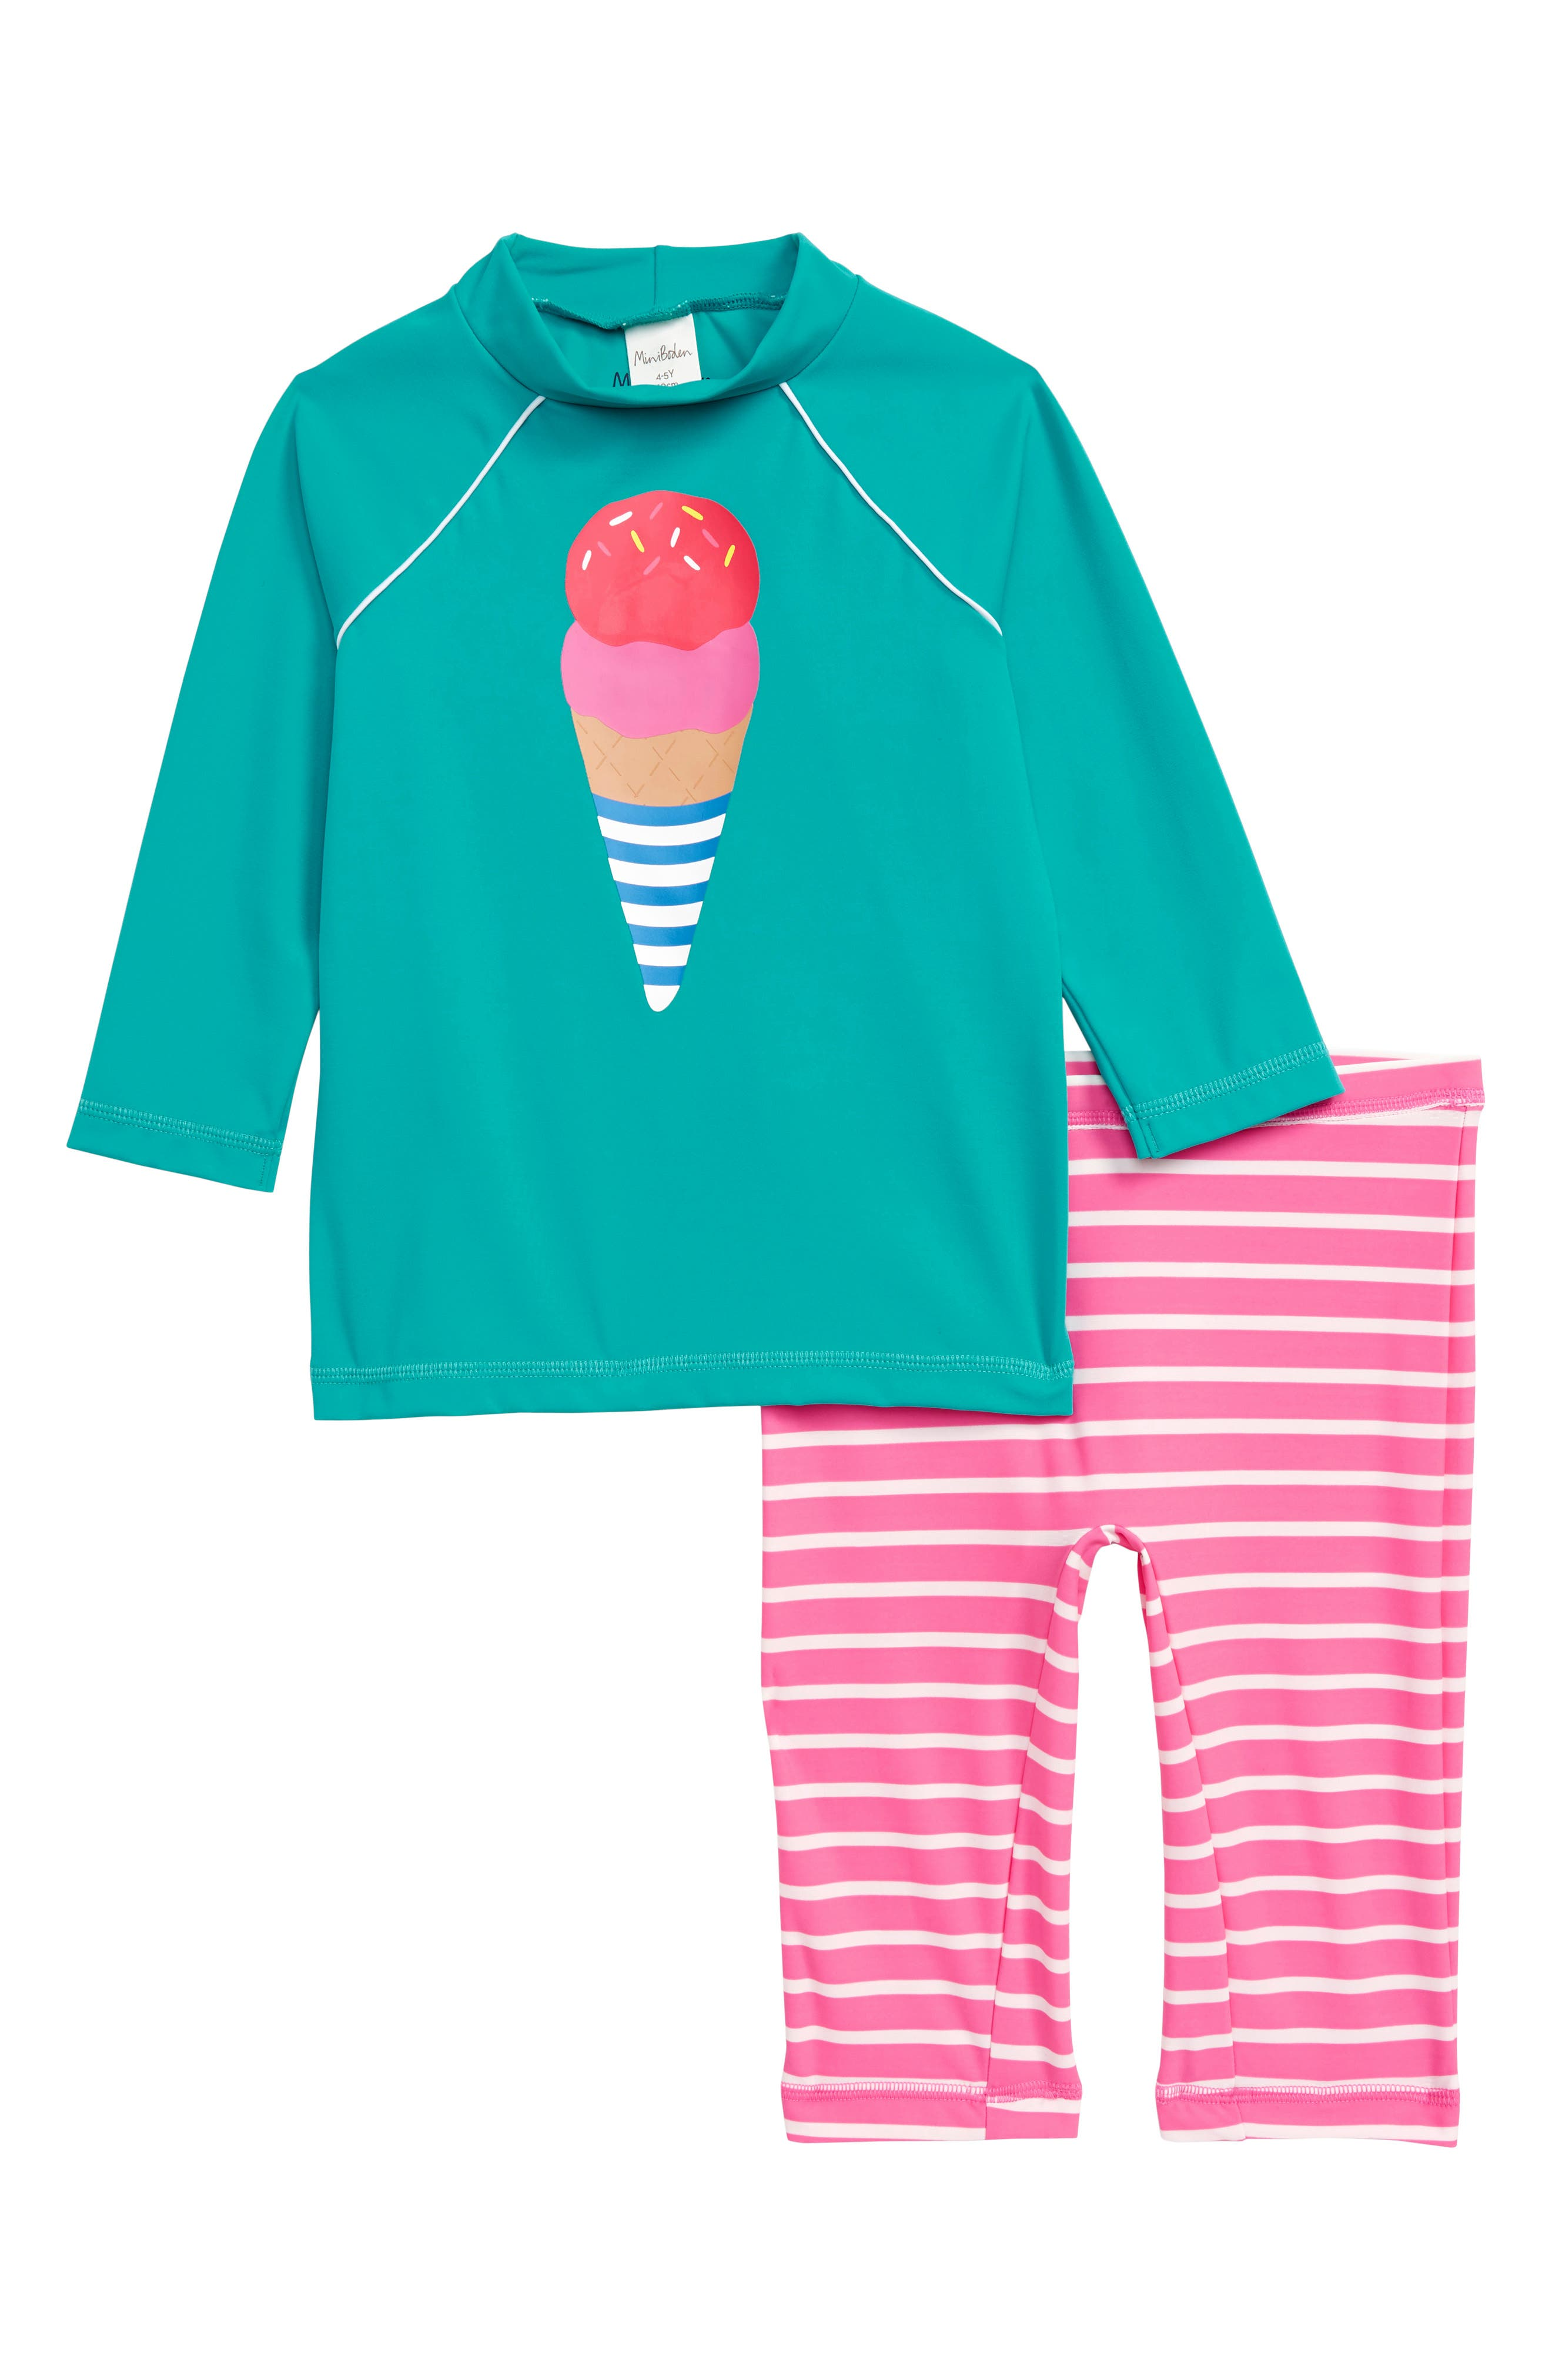 Sea Explorer Two-Piece Rashguard Swimsuit, Main, color, JADE GREEN/ IVORY ICE CREAM